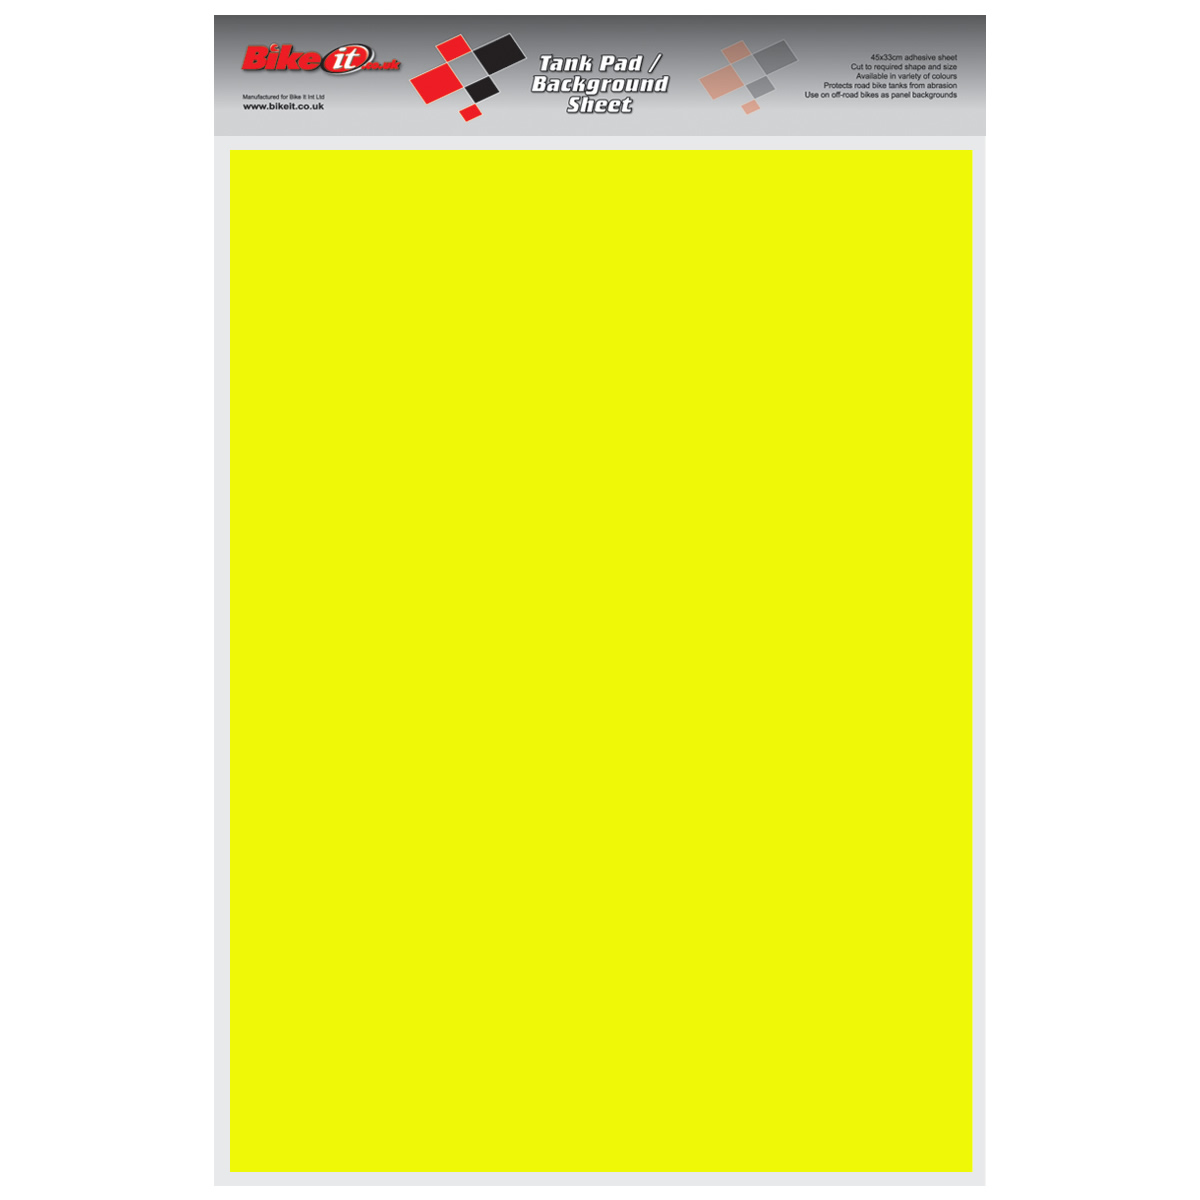 Bike it motorrad tankschutz pad klebefolie farbig for Klebefolie farbig